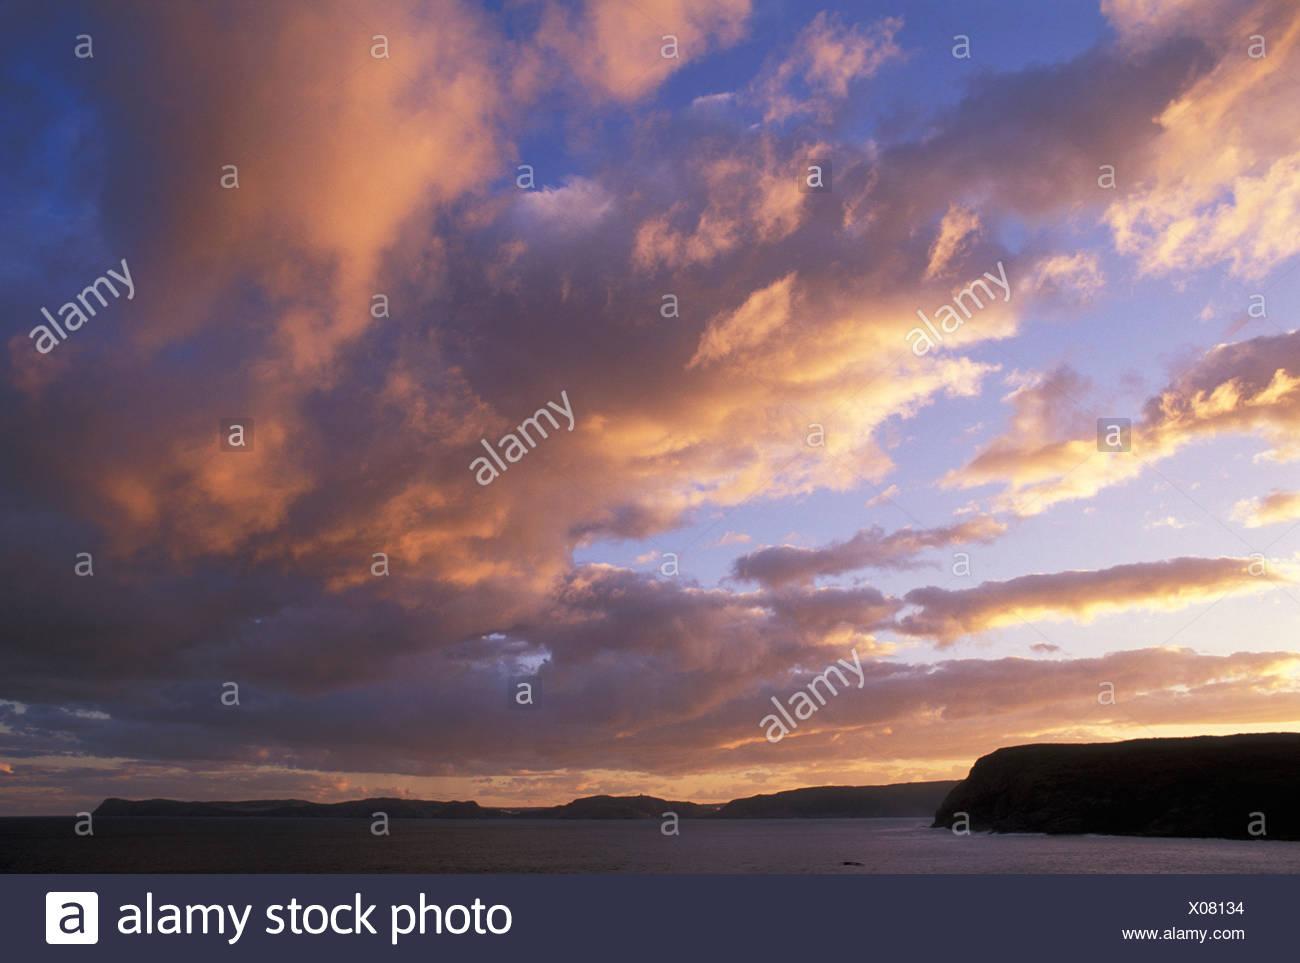 St. John's Bay, Cape Spear, Newfoundland, Canada, sky, sunset, clouds, ocean, sea, land, water, coast, - Stock Image